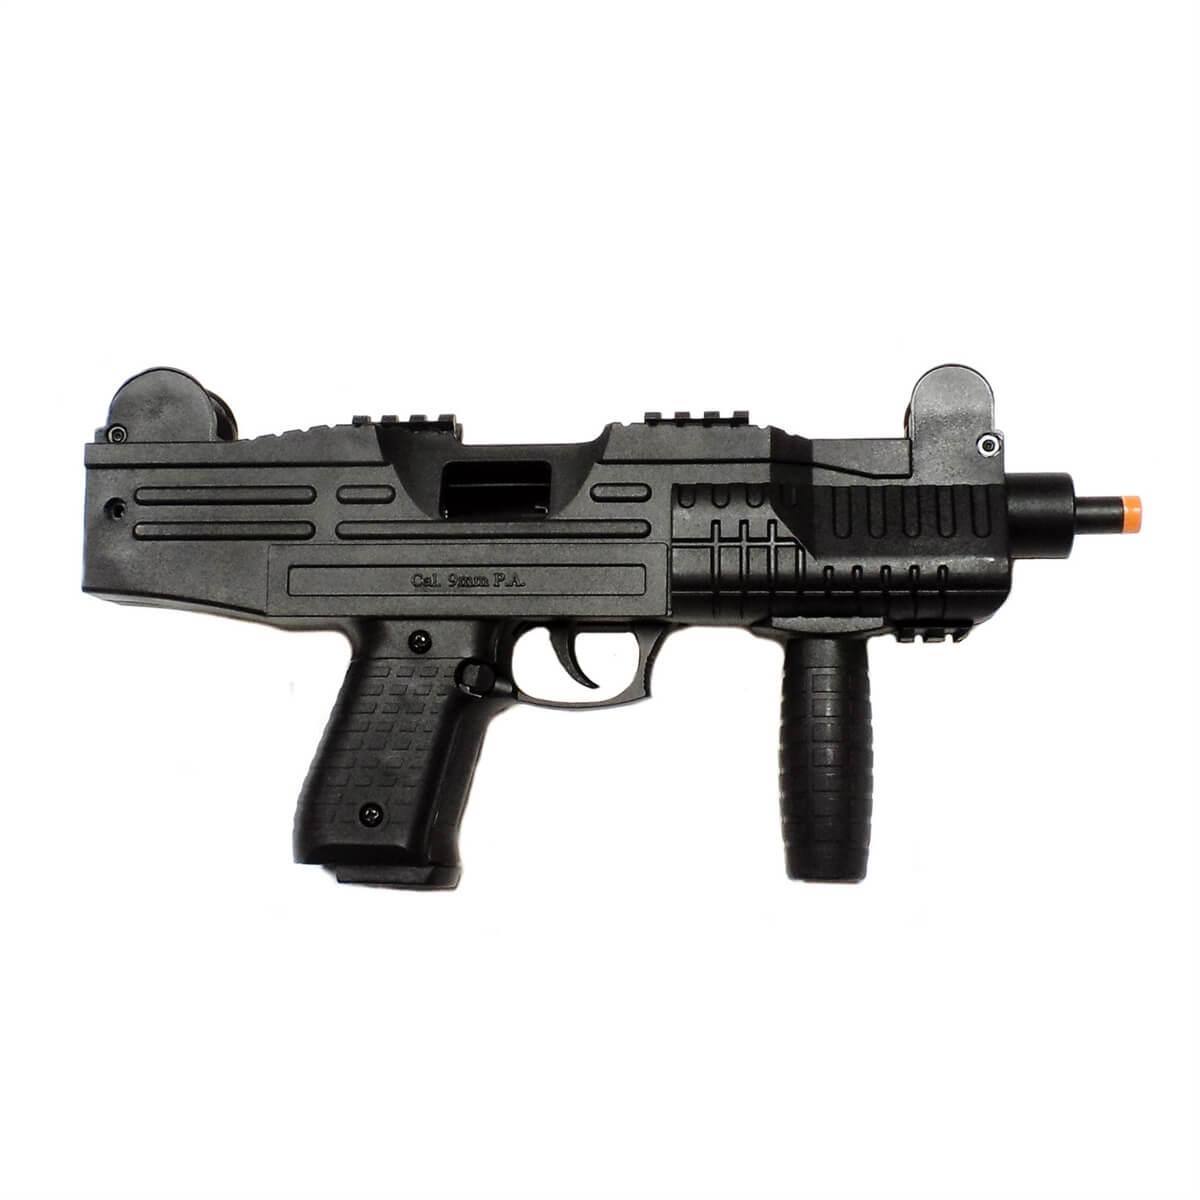 UZI Blank Gun for Sale